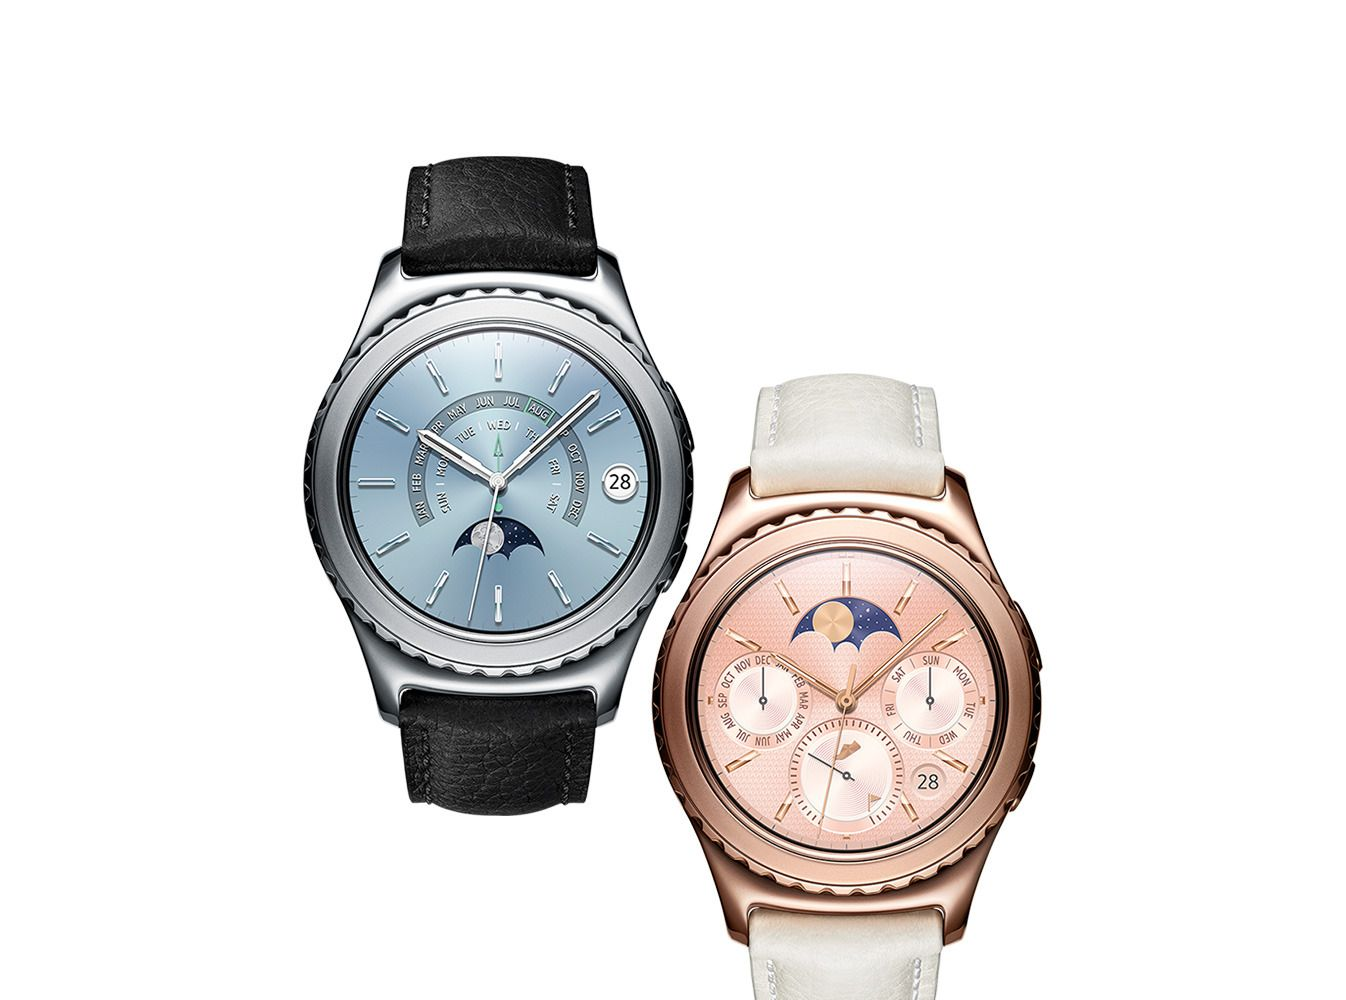 Gear S2 i platina (til venstre) og roségull (til høyre), med dertil tilhørende urskiver og klokkeremmer.